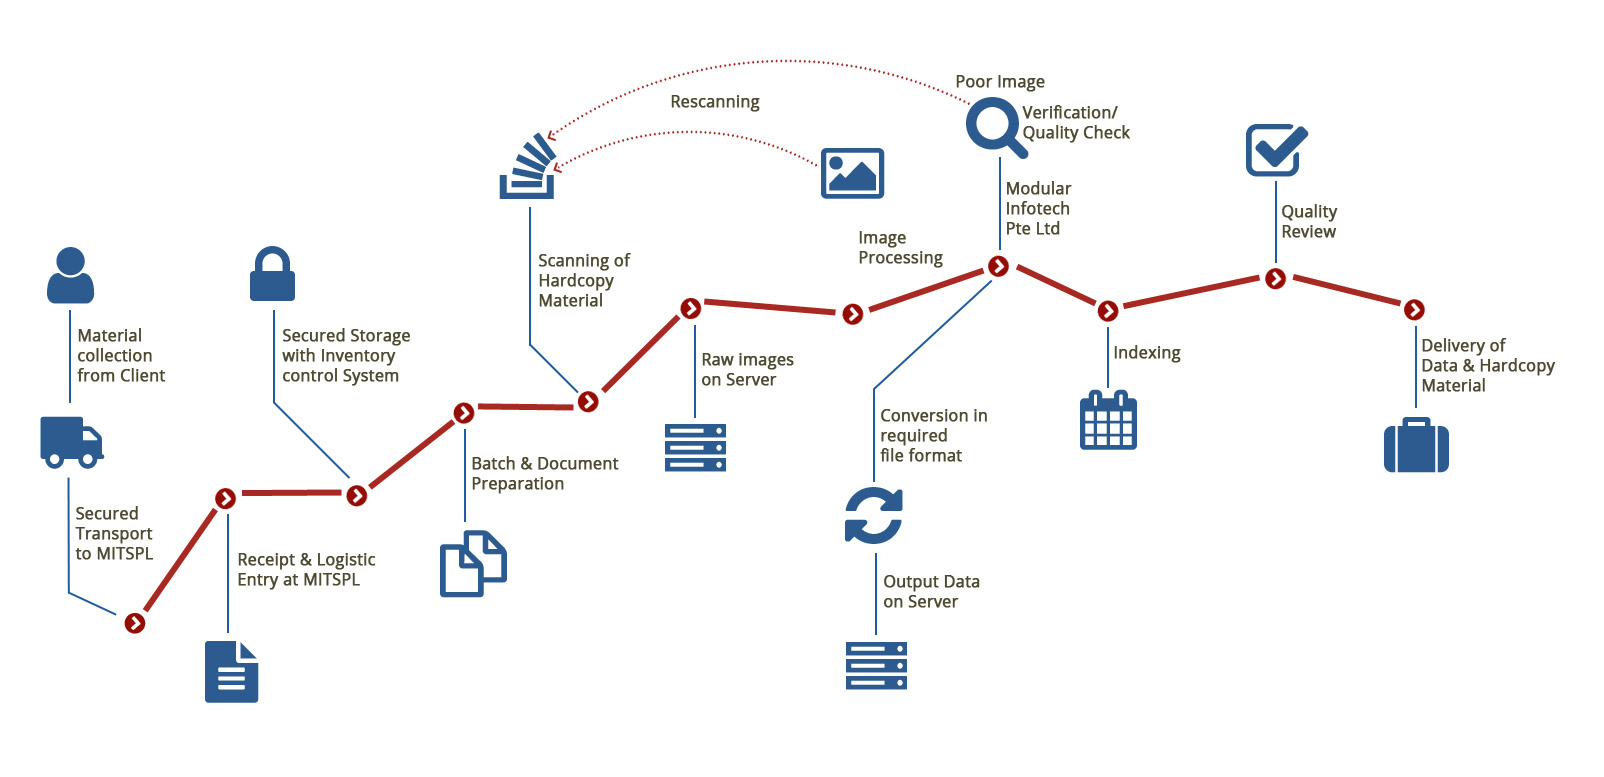 Our Services - Modular Info Tech (Singapore) Pte Ltd